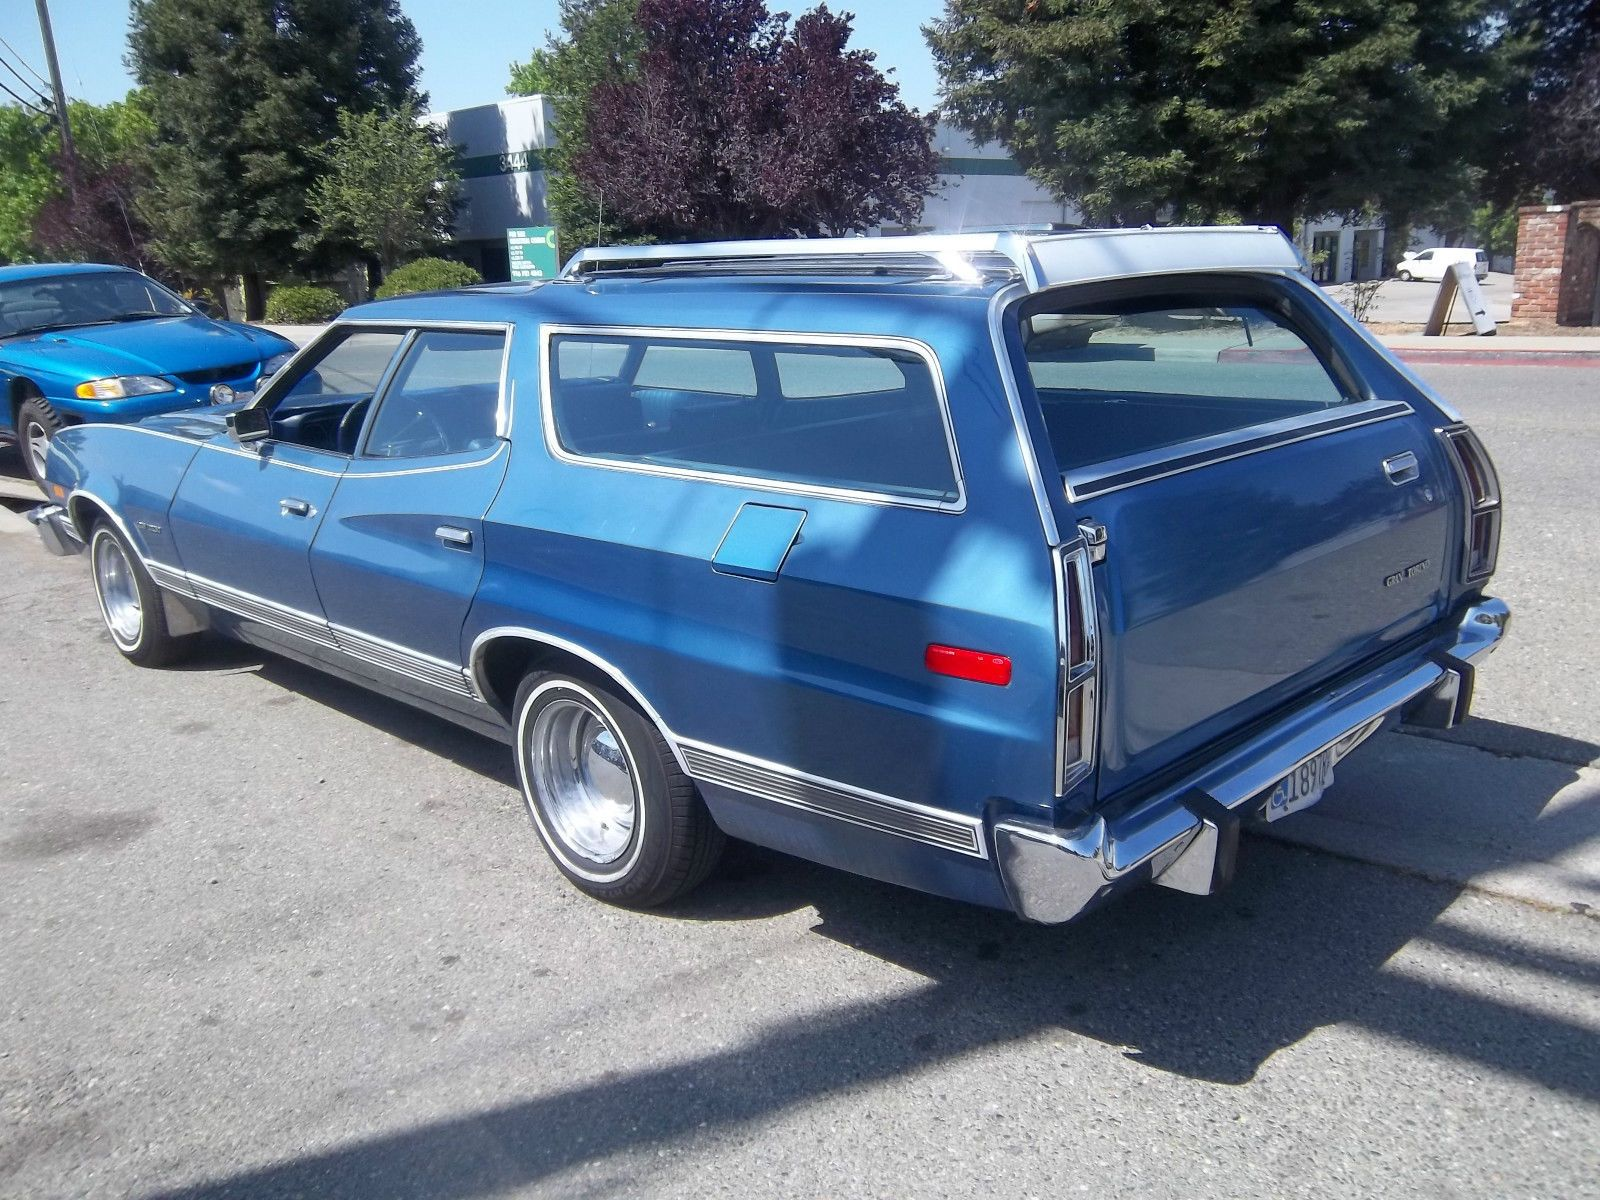 73 ford gran torino station wagon